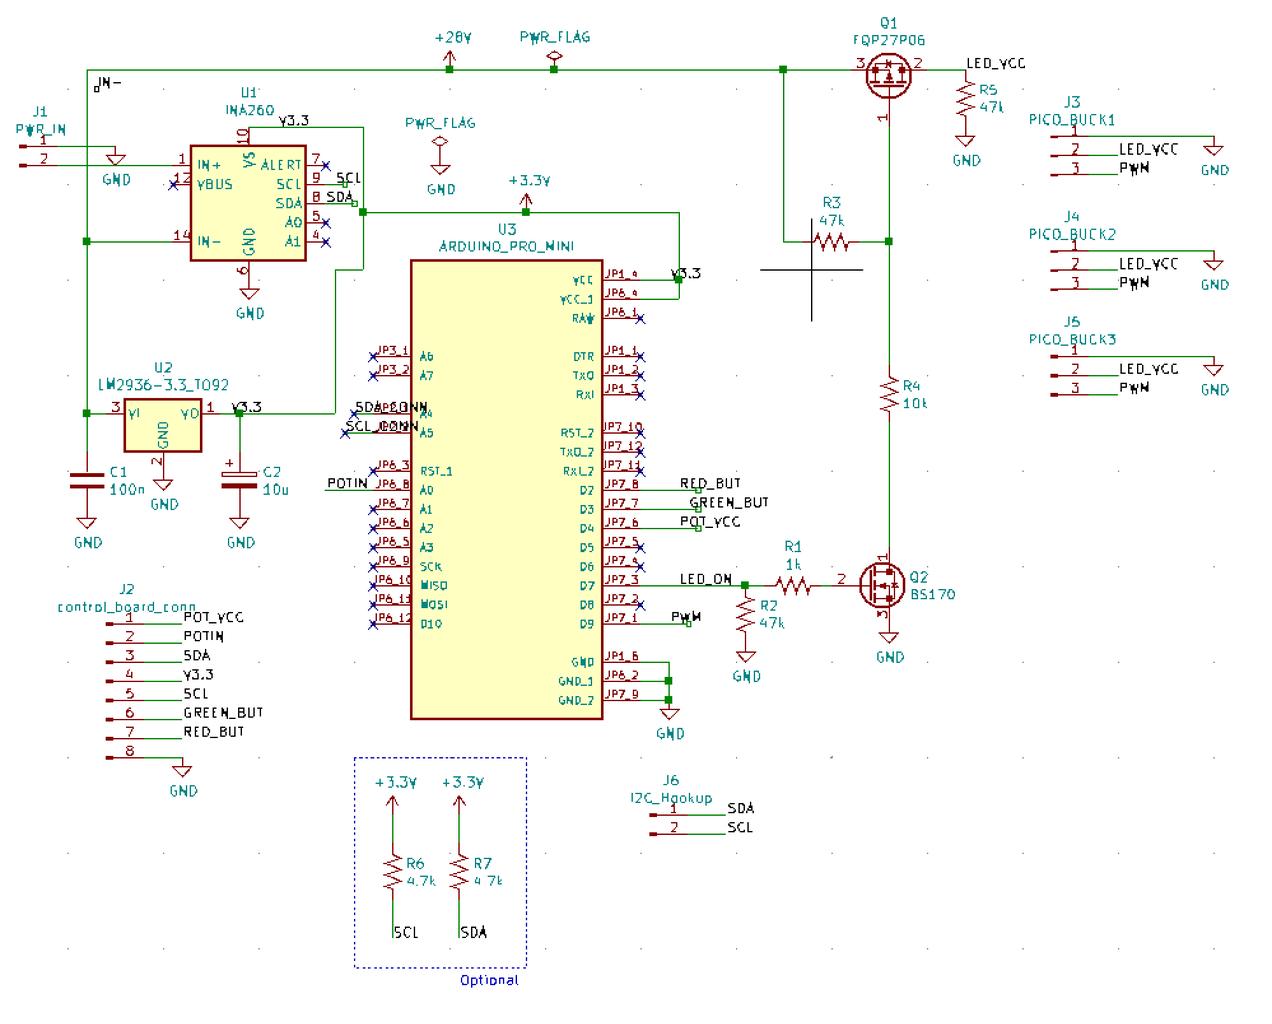 Main Schematic Overview